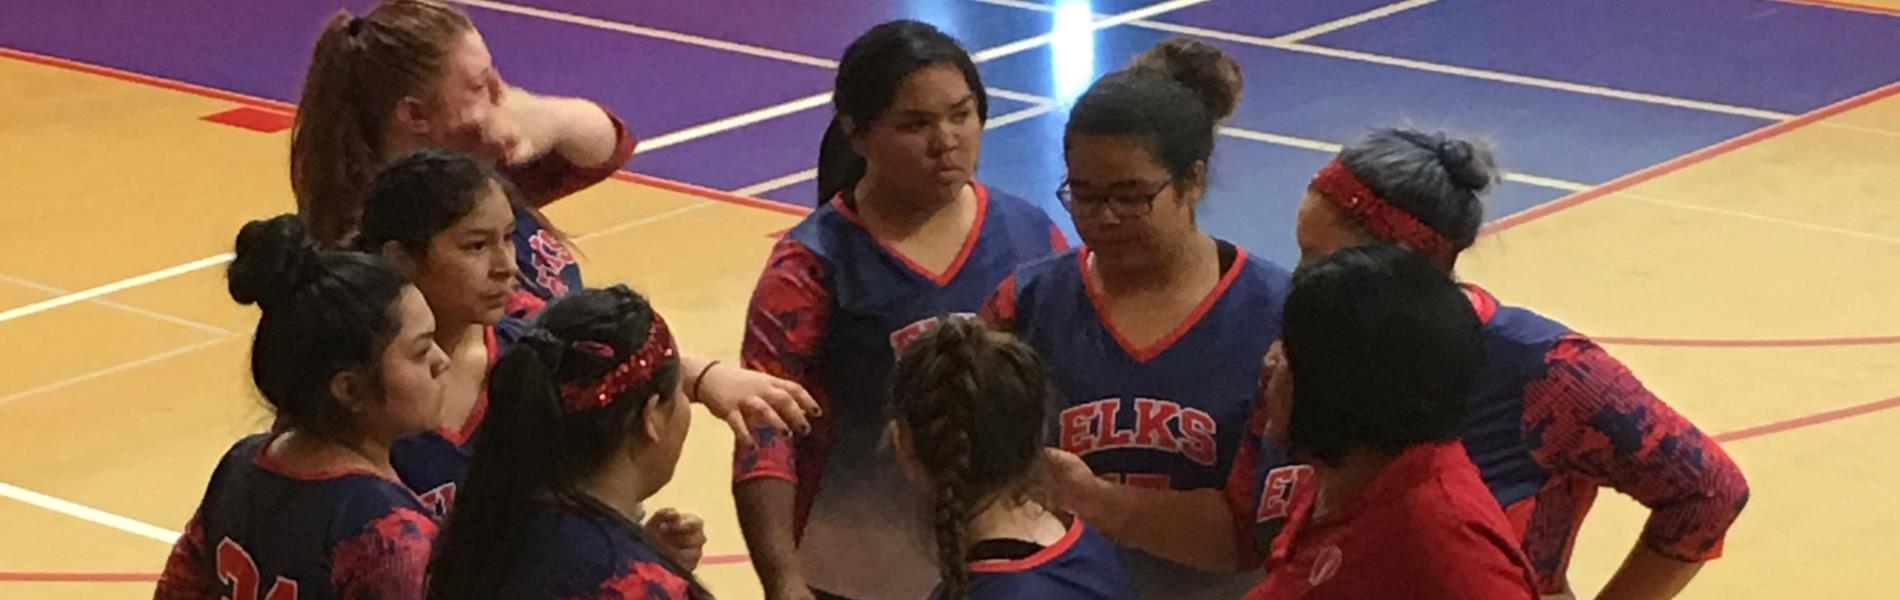 Girls volleyball team 2019